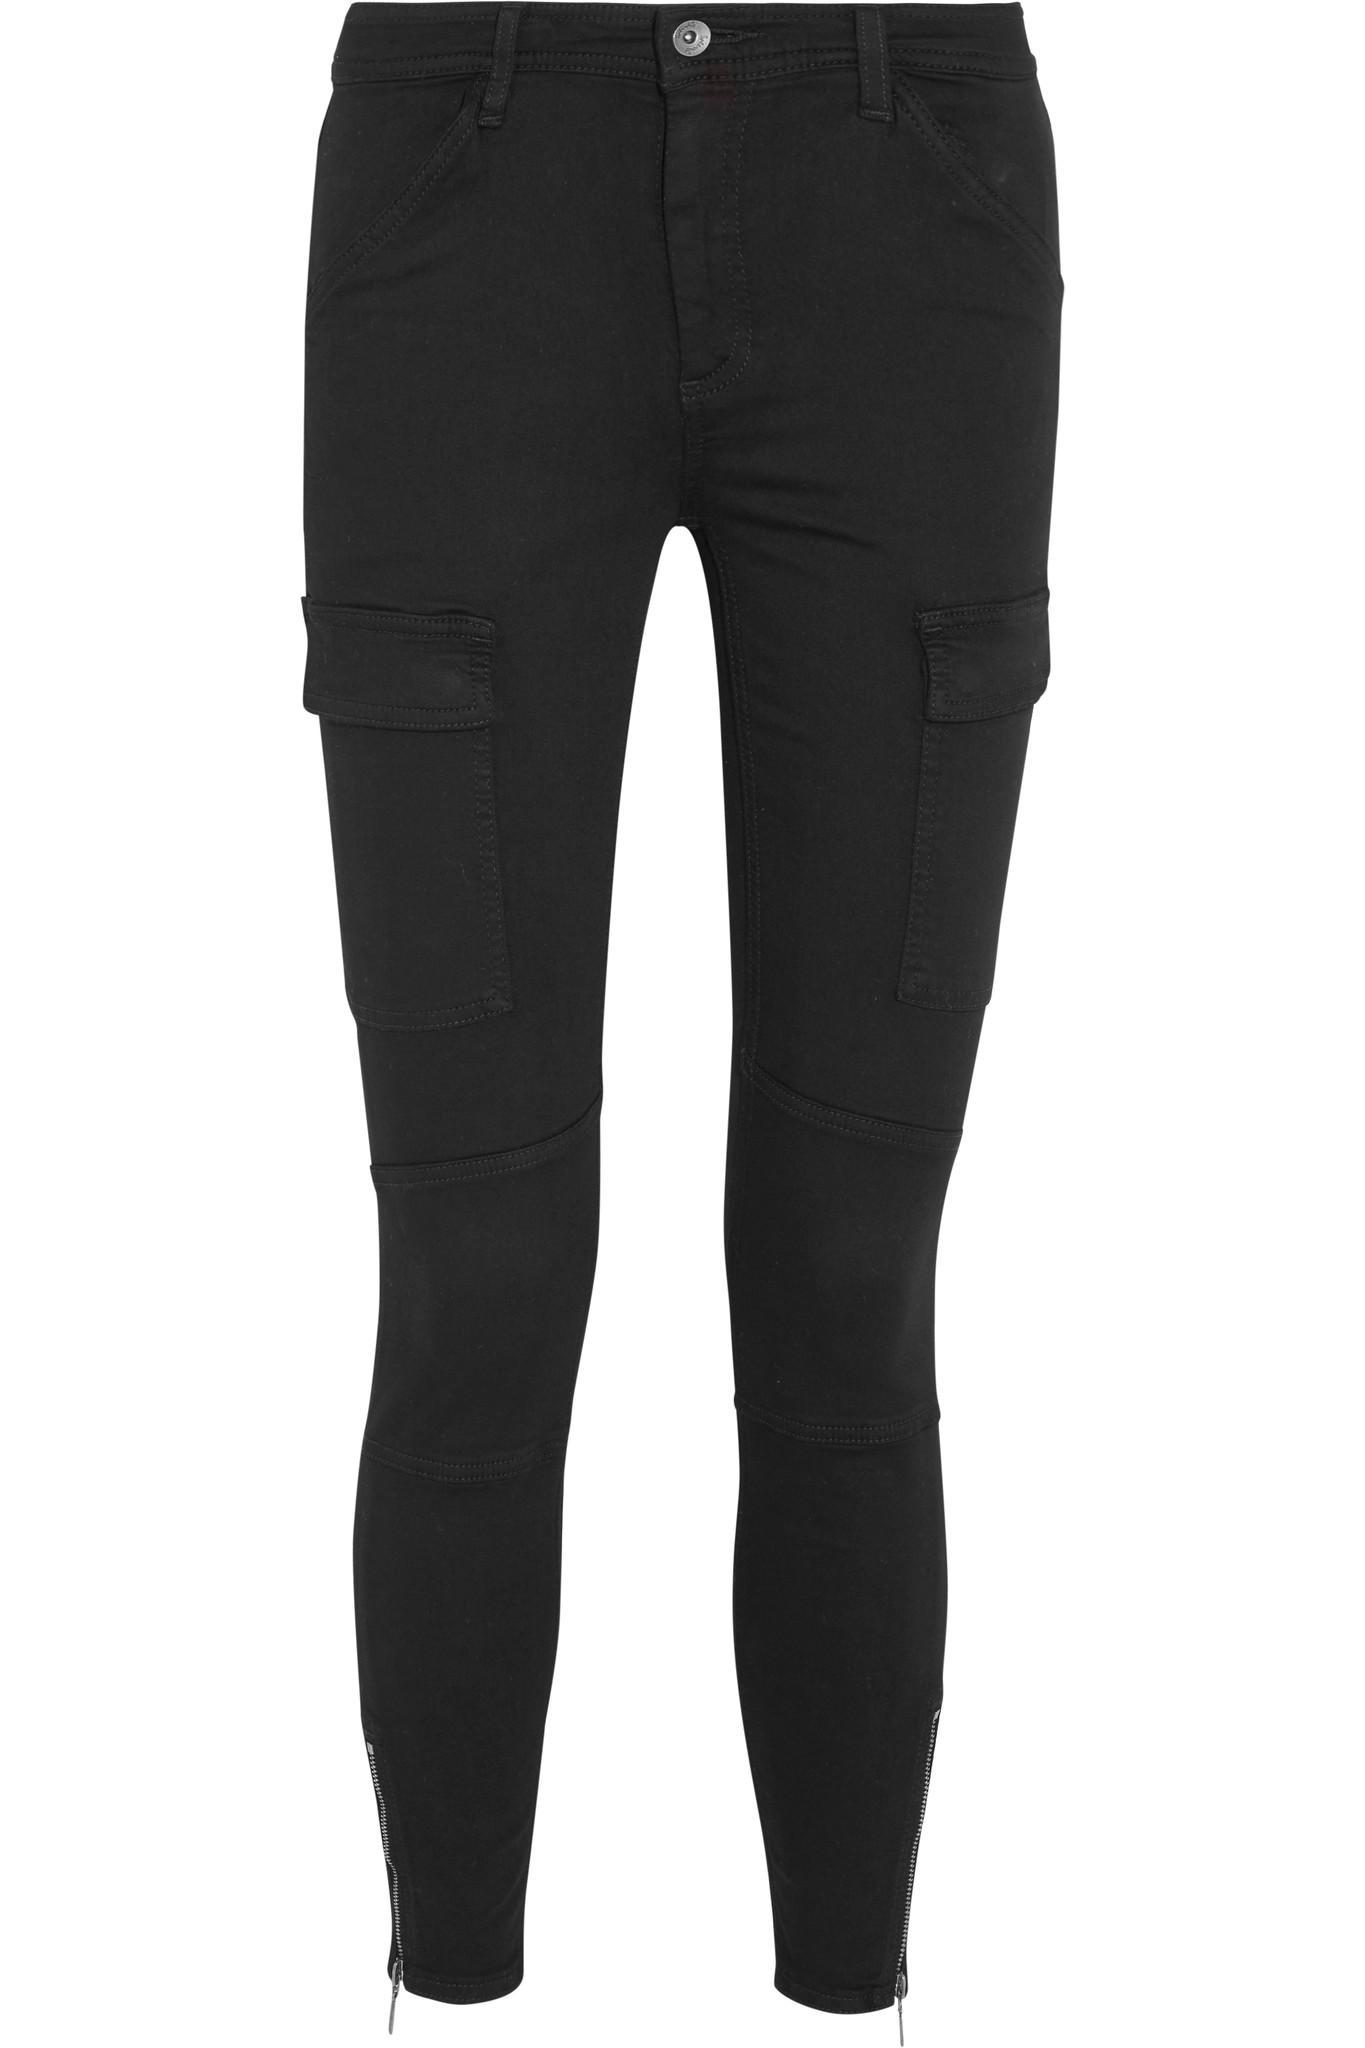 Splendid. Women's Black Hunter Stretch Modal-blend Twill Skinny Pants